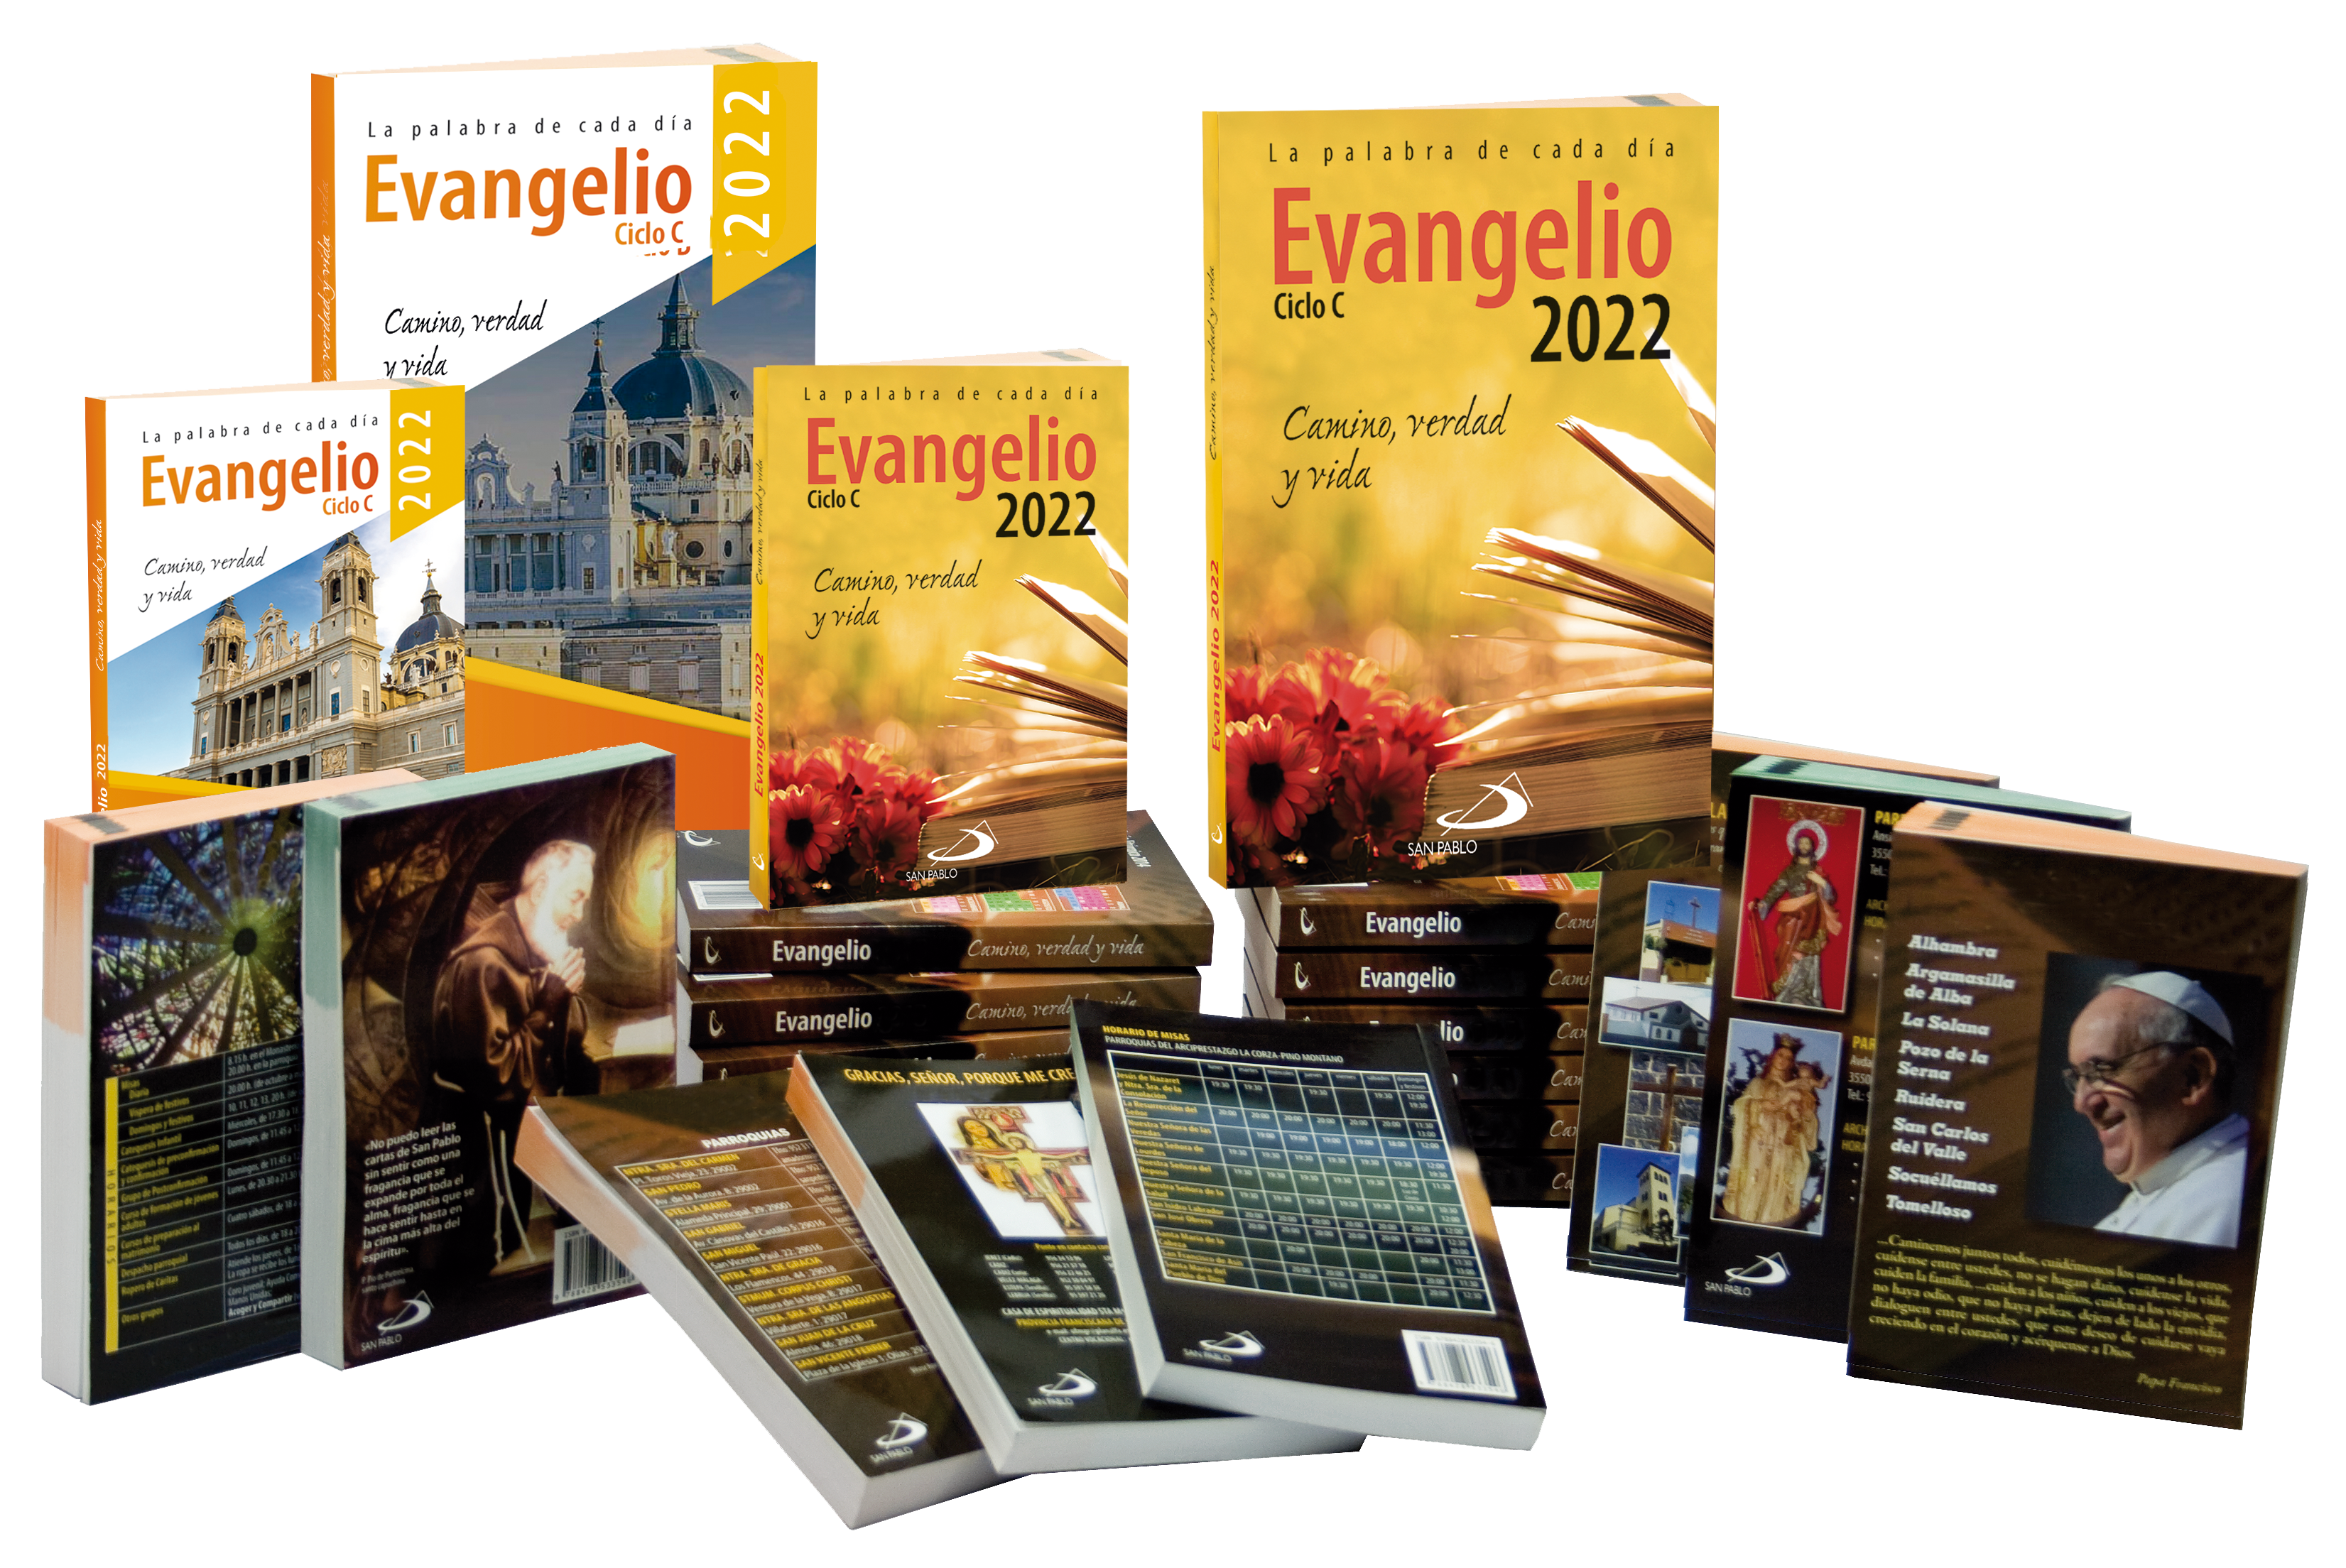 Evangelios San Pablo